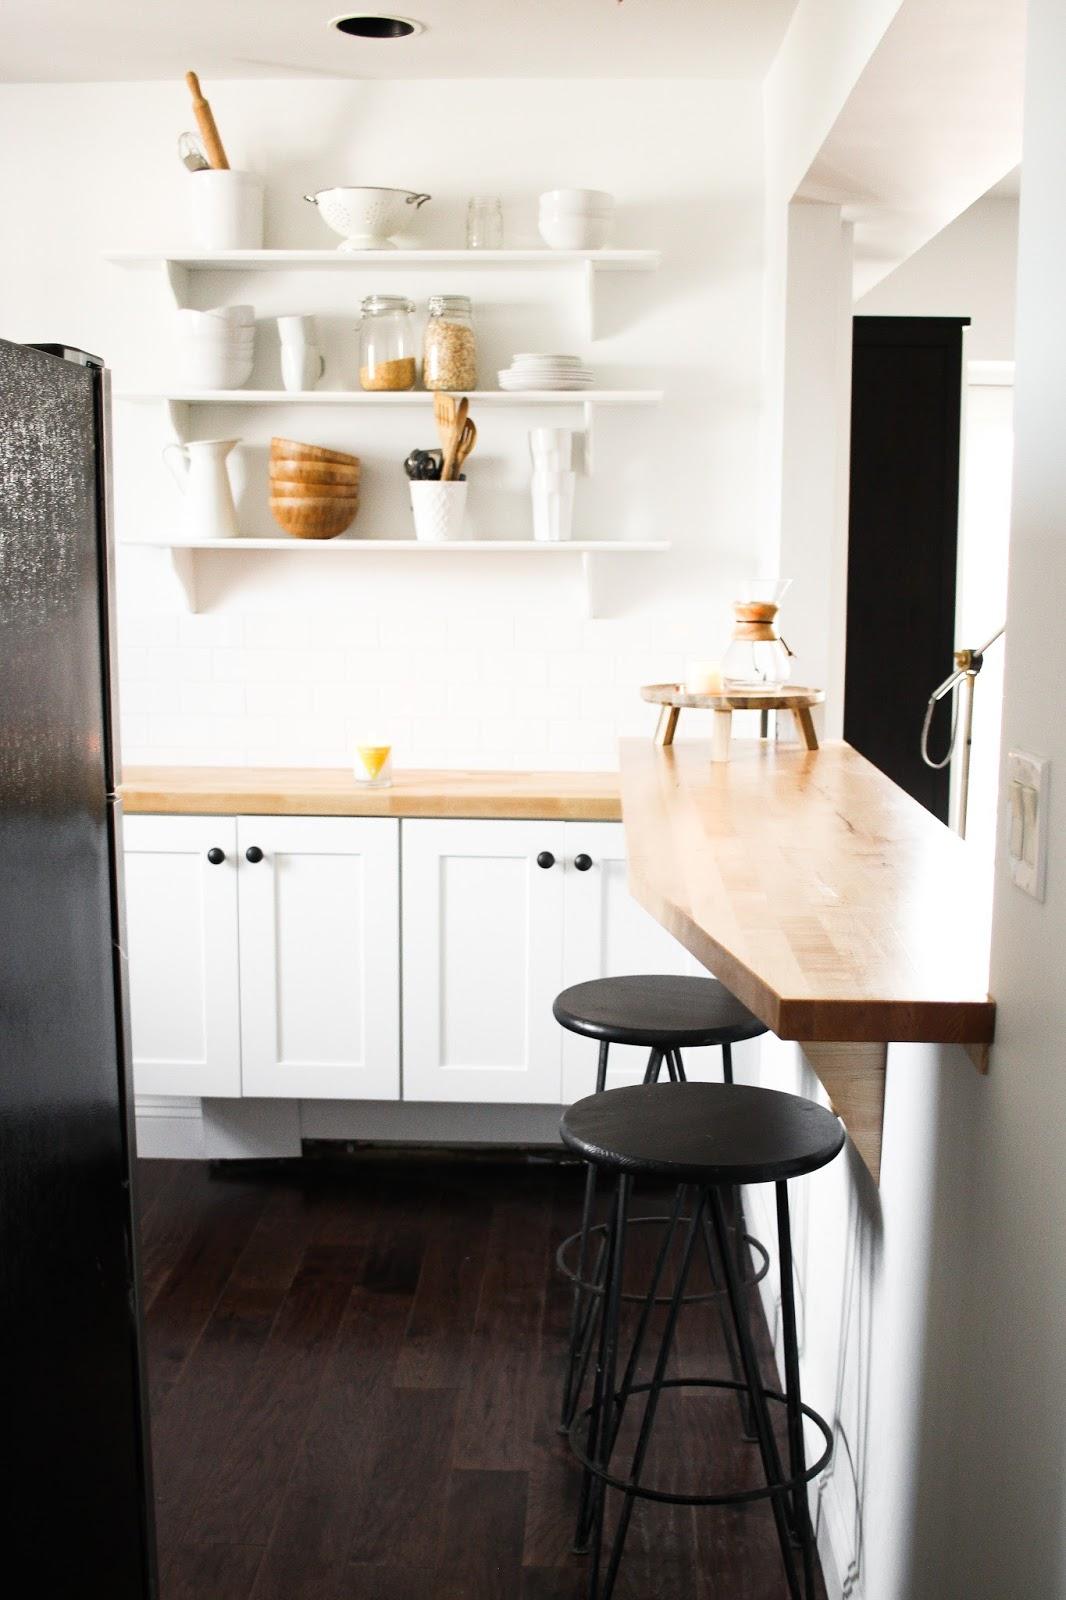 farmhouse kitchen, subway tile kitchen, white and wood kitchen, butcher block counter, west elm kitchen